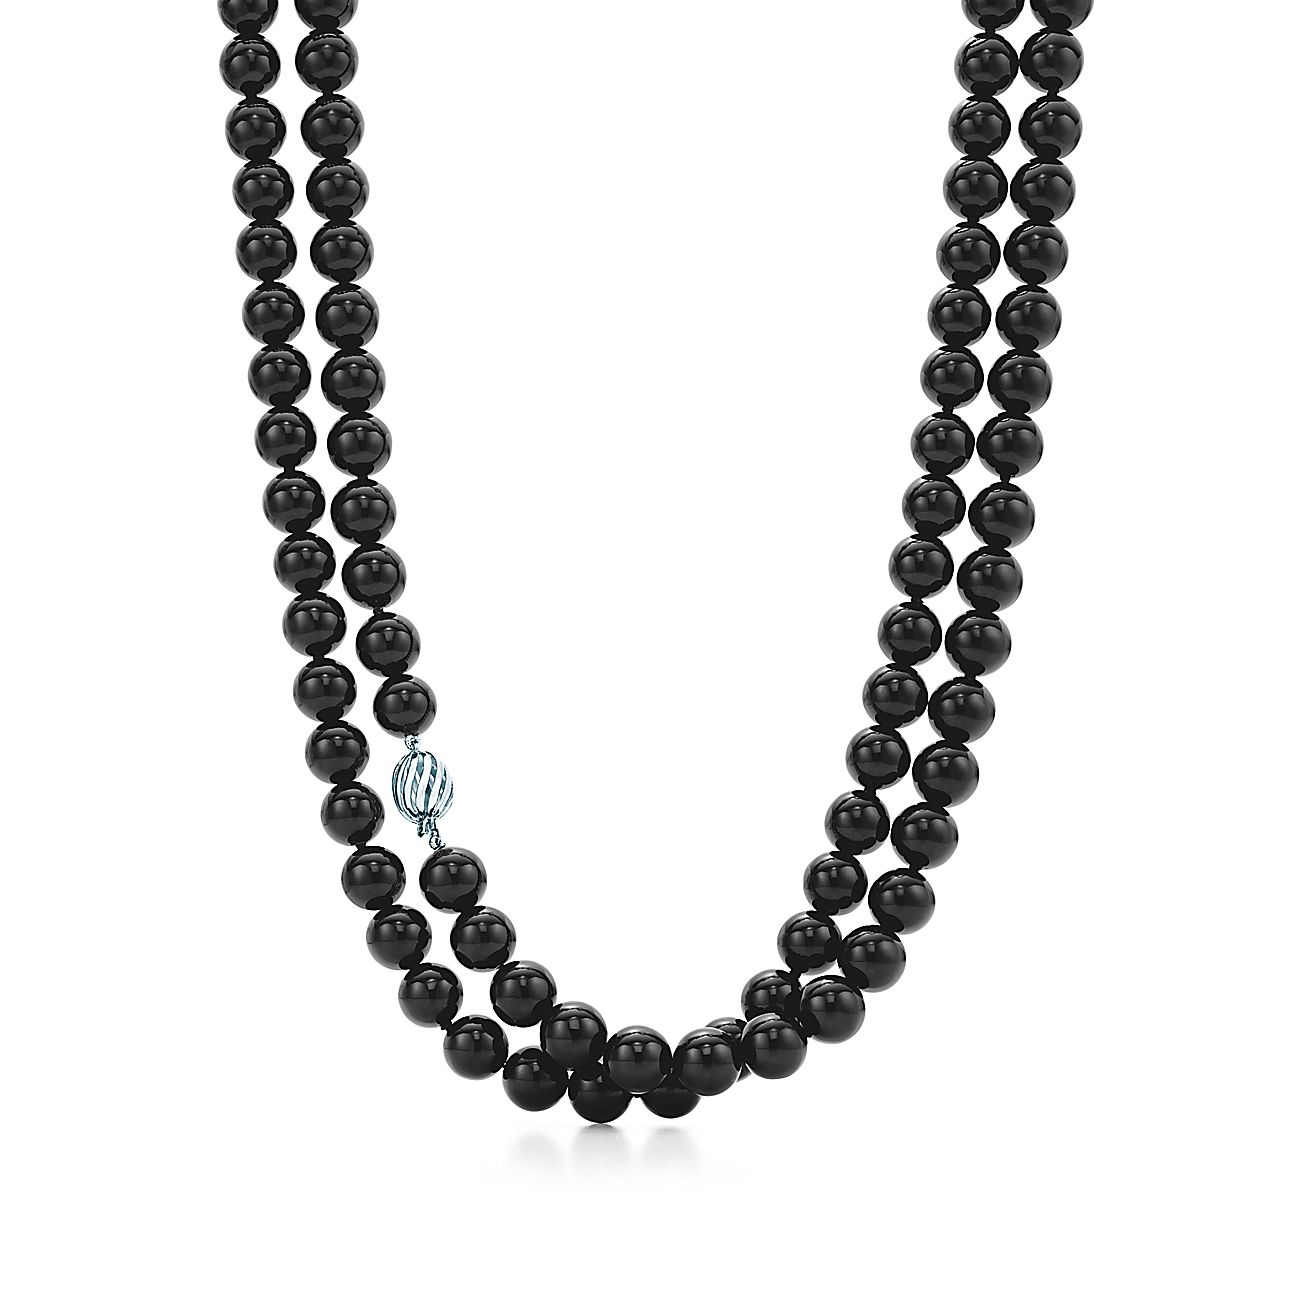 Ziegfeld Collection:Necklace